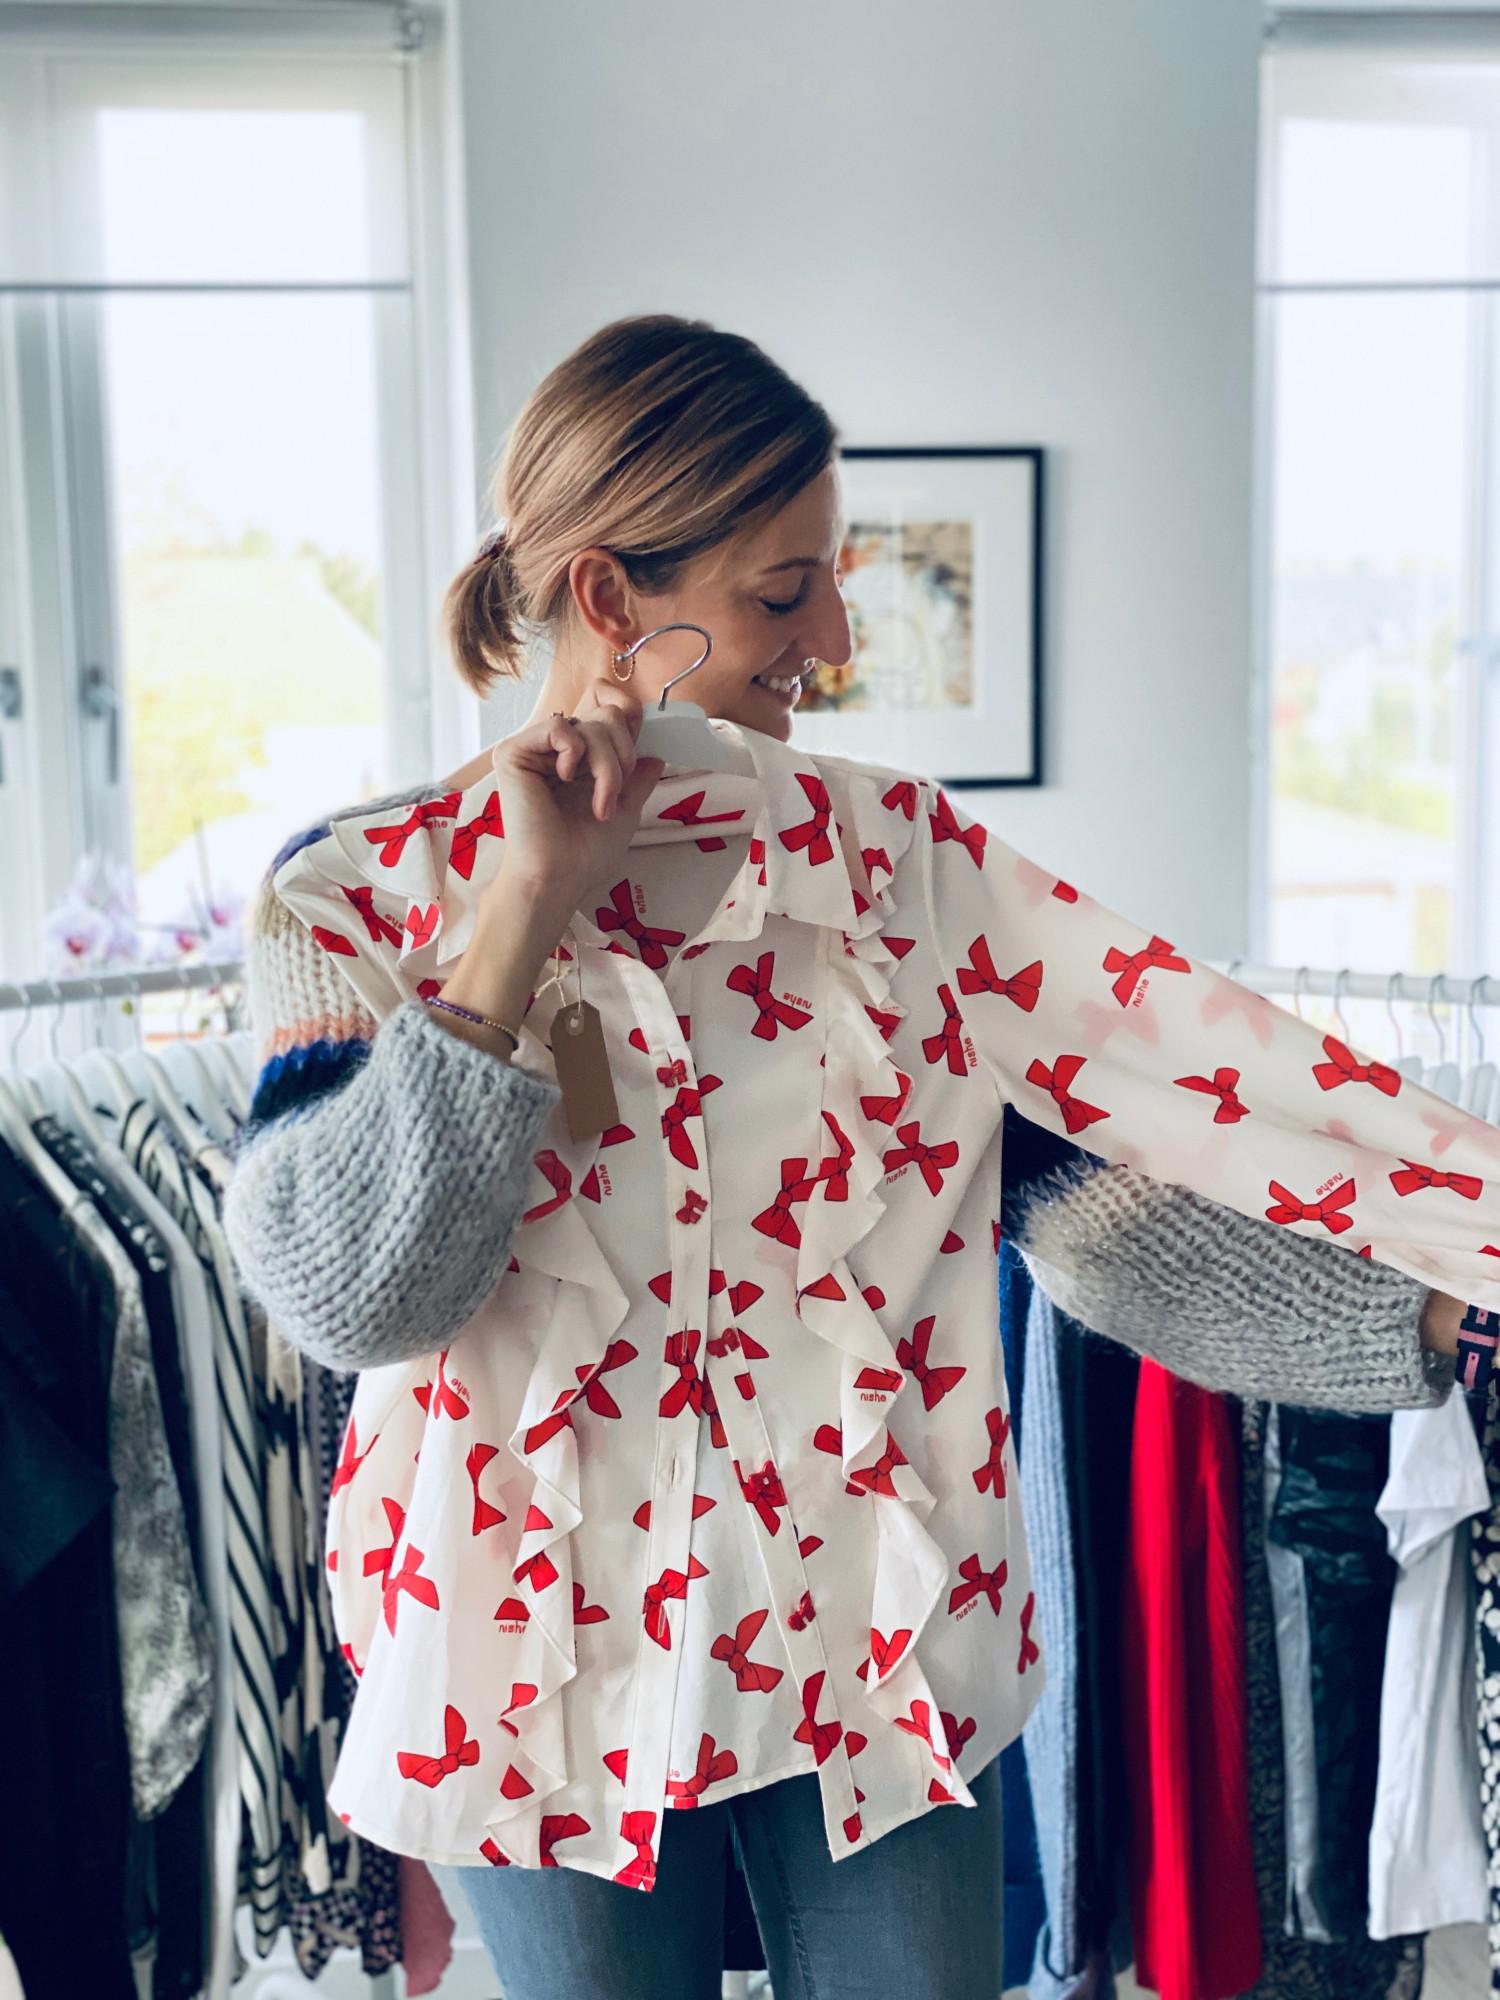 Annemette Voss second hand shopping